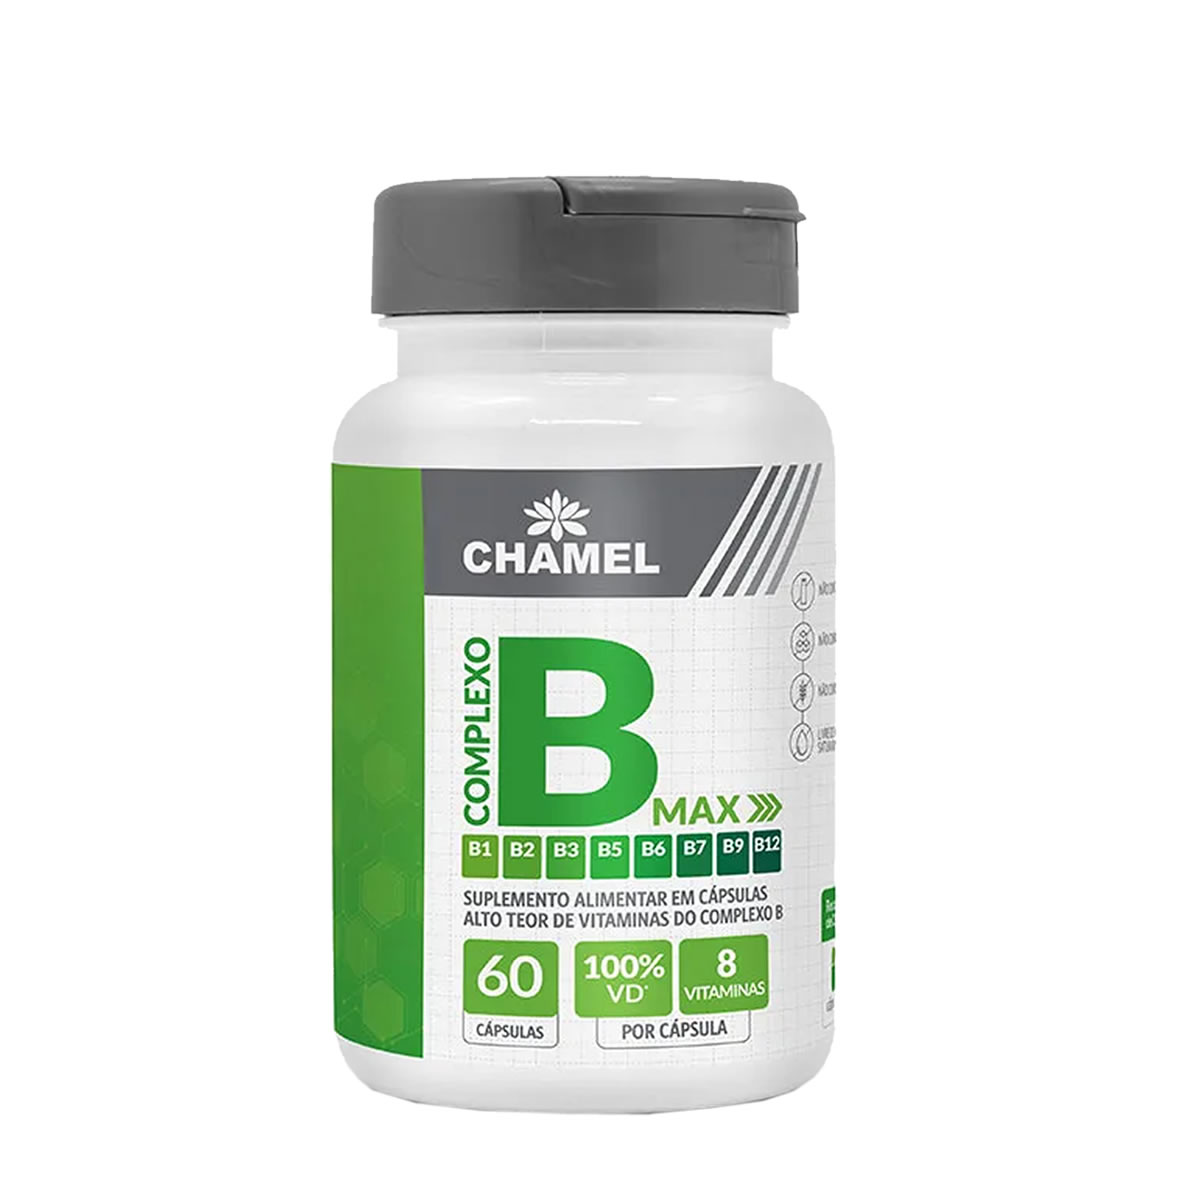 Vitamina Complexo B Max 500mg 60 Capsulas - Chamel